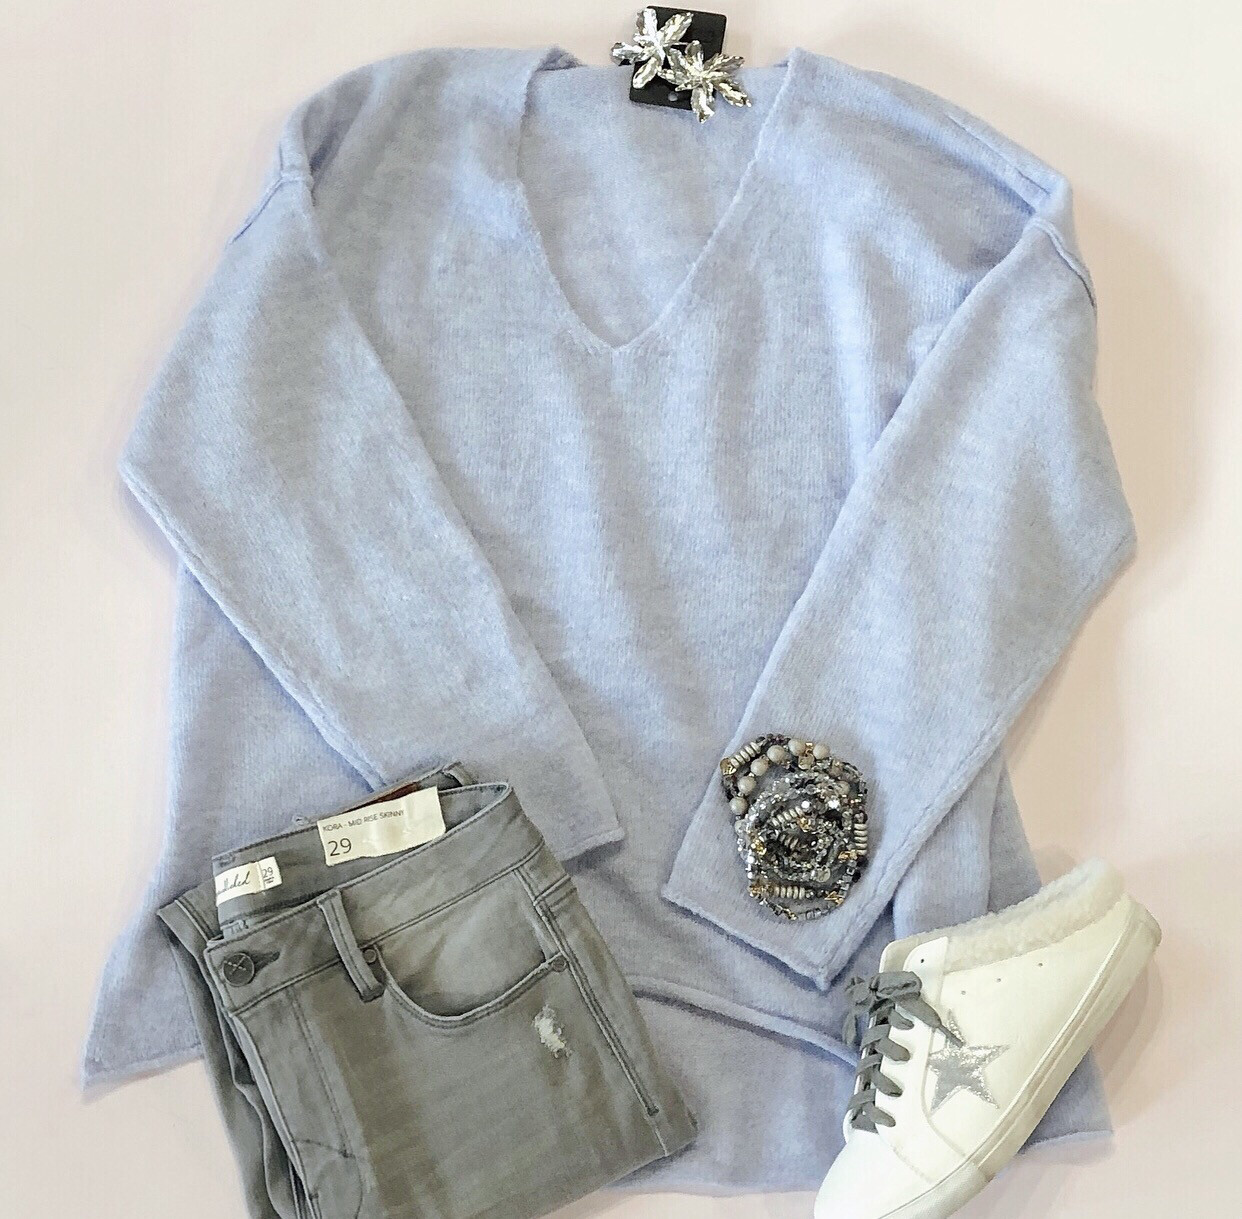 Lavender Dreams Sweater